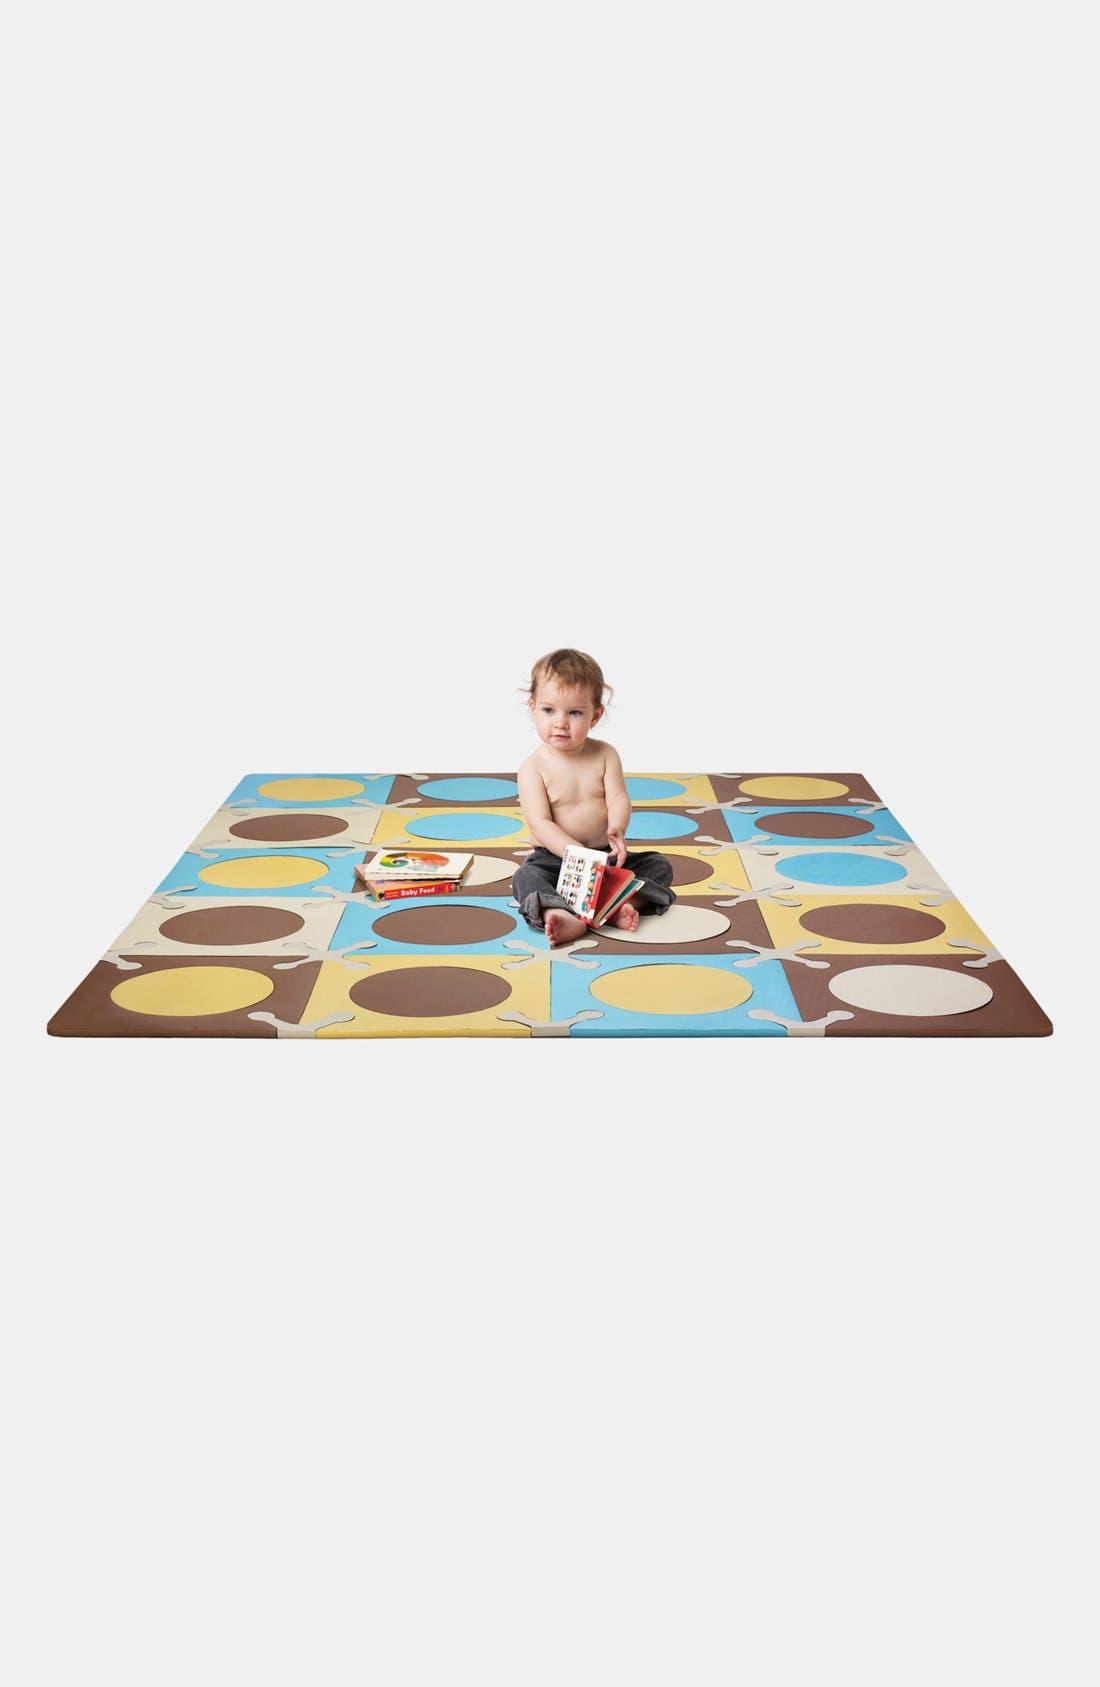 Main Image - Skip Hop 'PLAYSPOTS - Zoo' Foam Floor Tiles